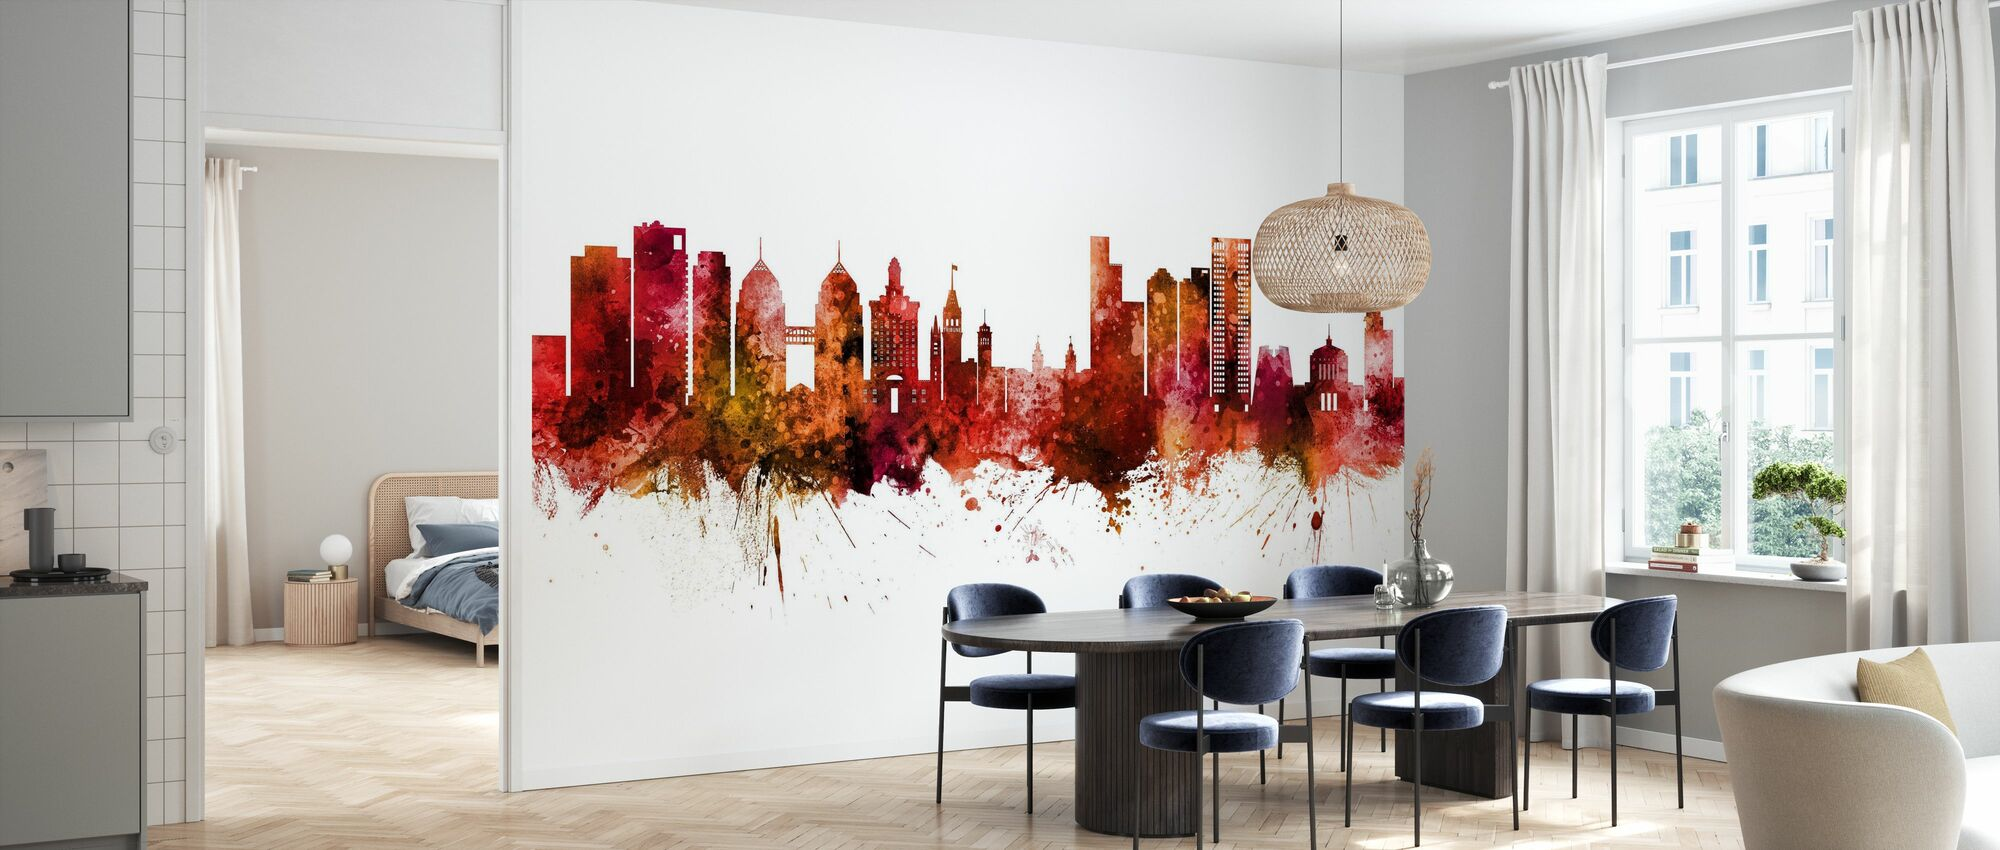 Oakland California Skyline - Wallpaper - Kitchen